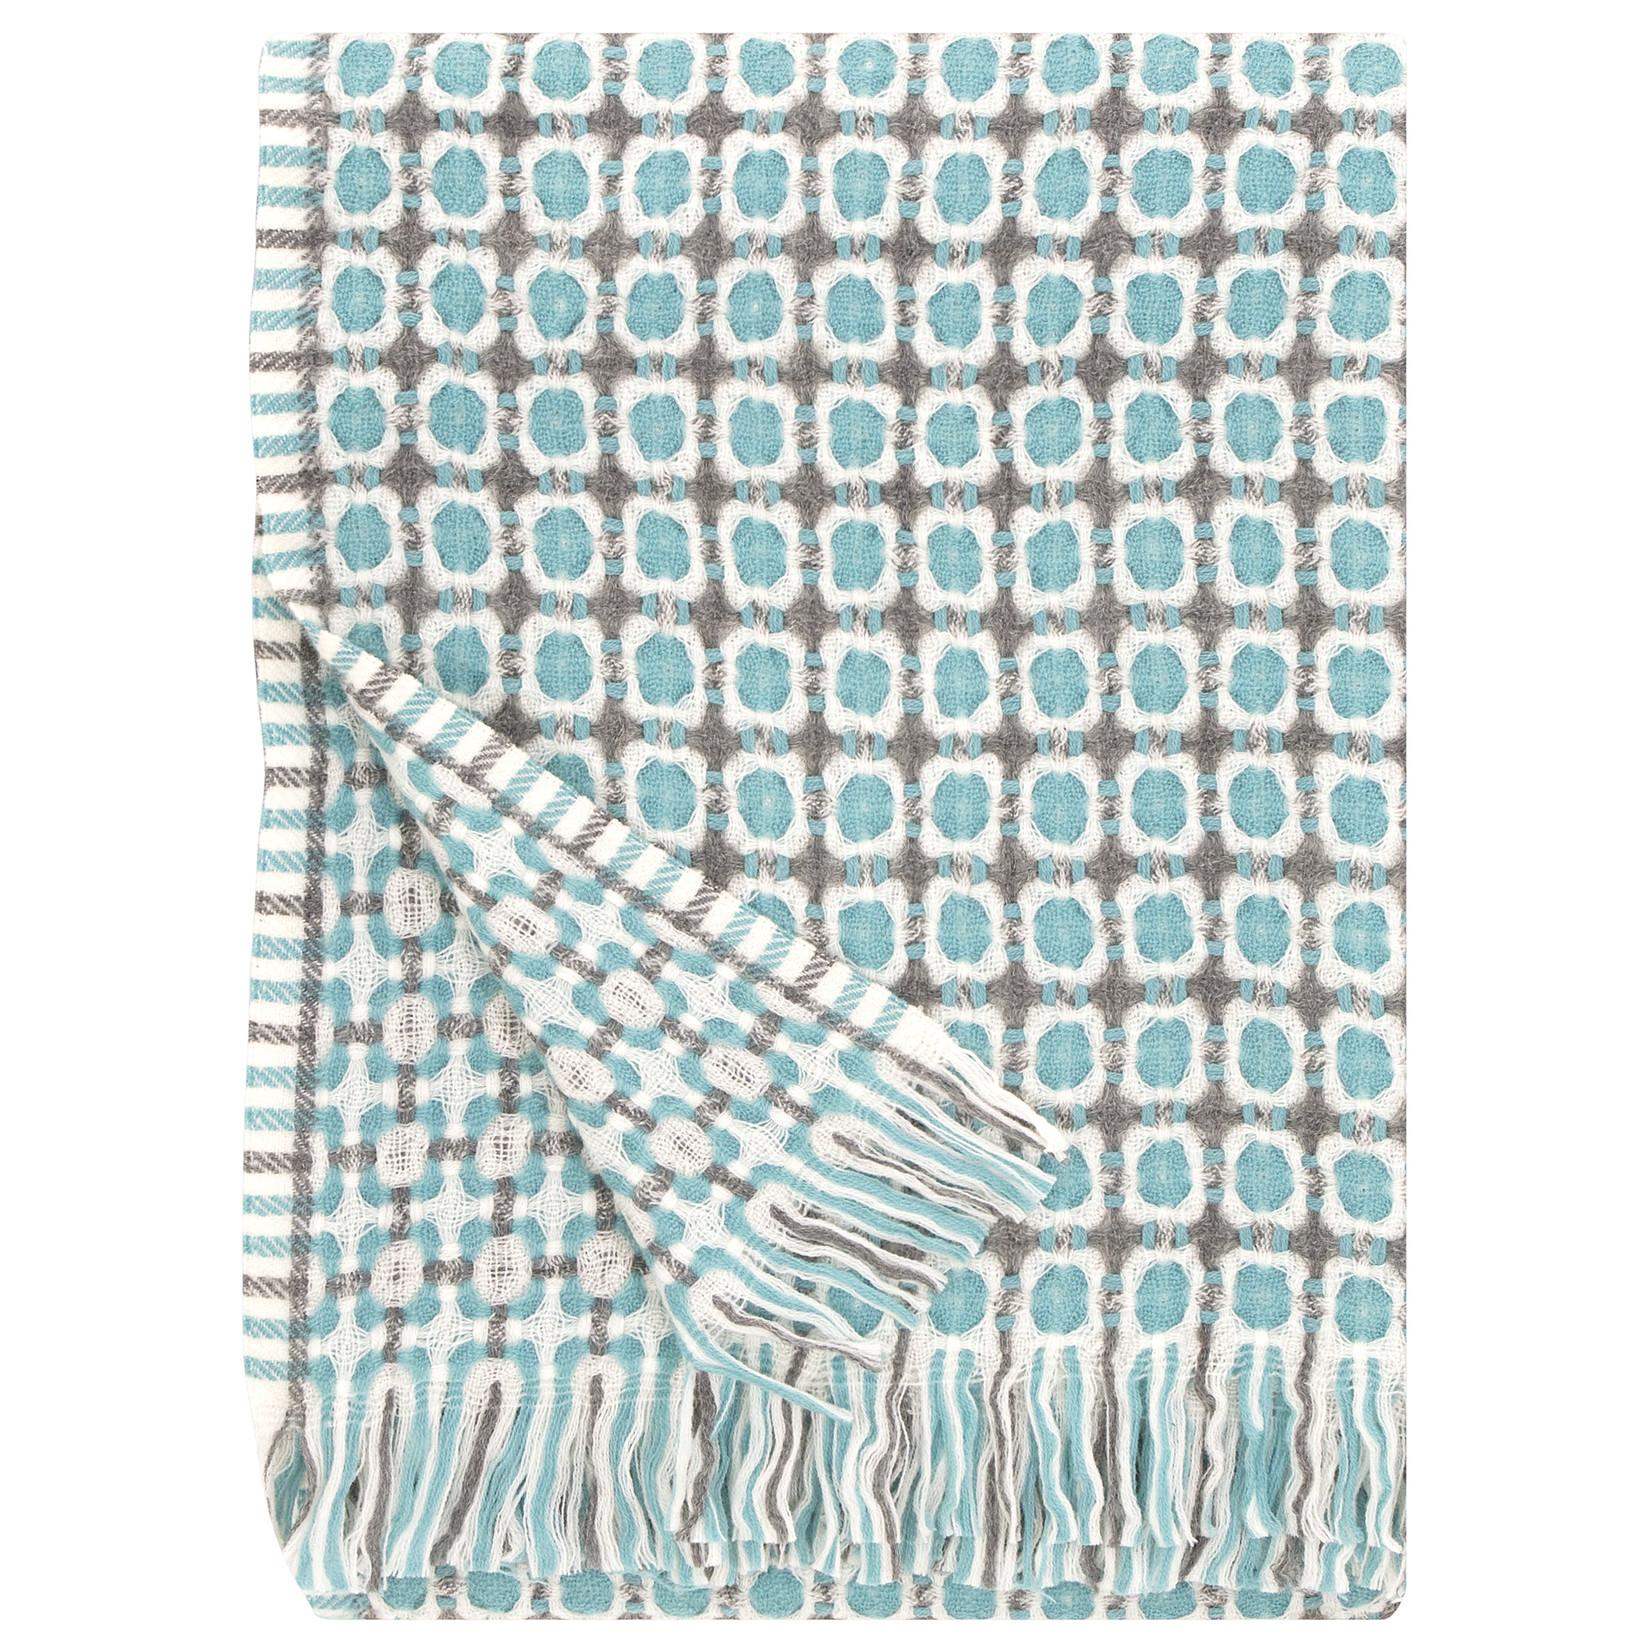 Lapuan Kankurit LAPUAN blanket, 100% wool - 3 colours